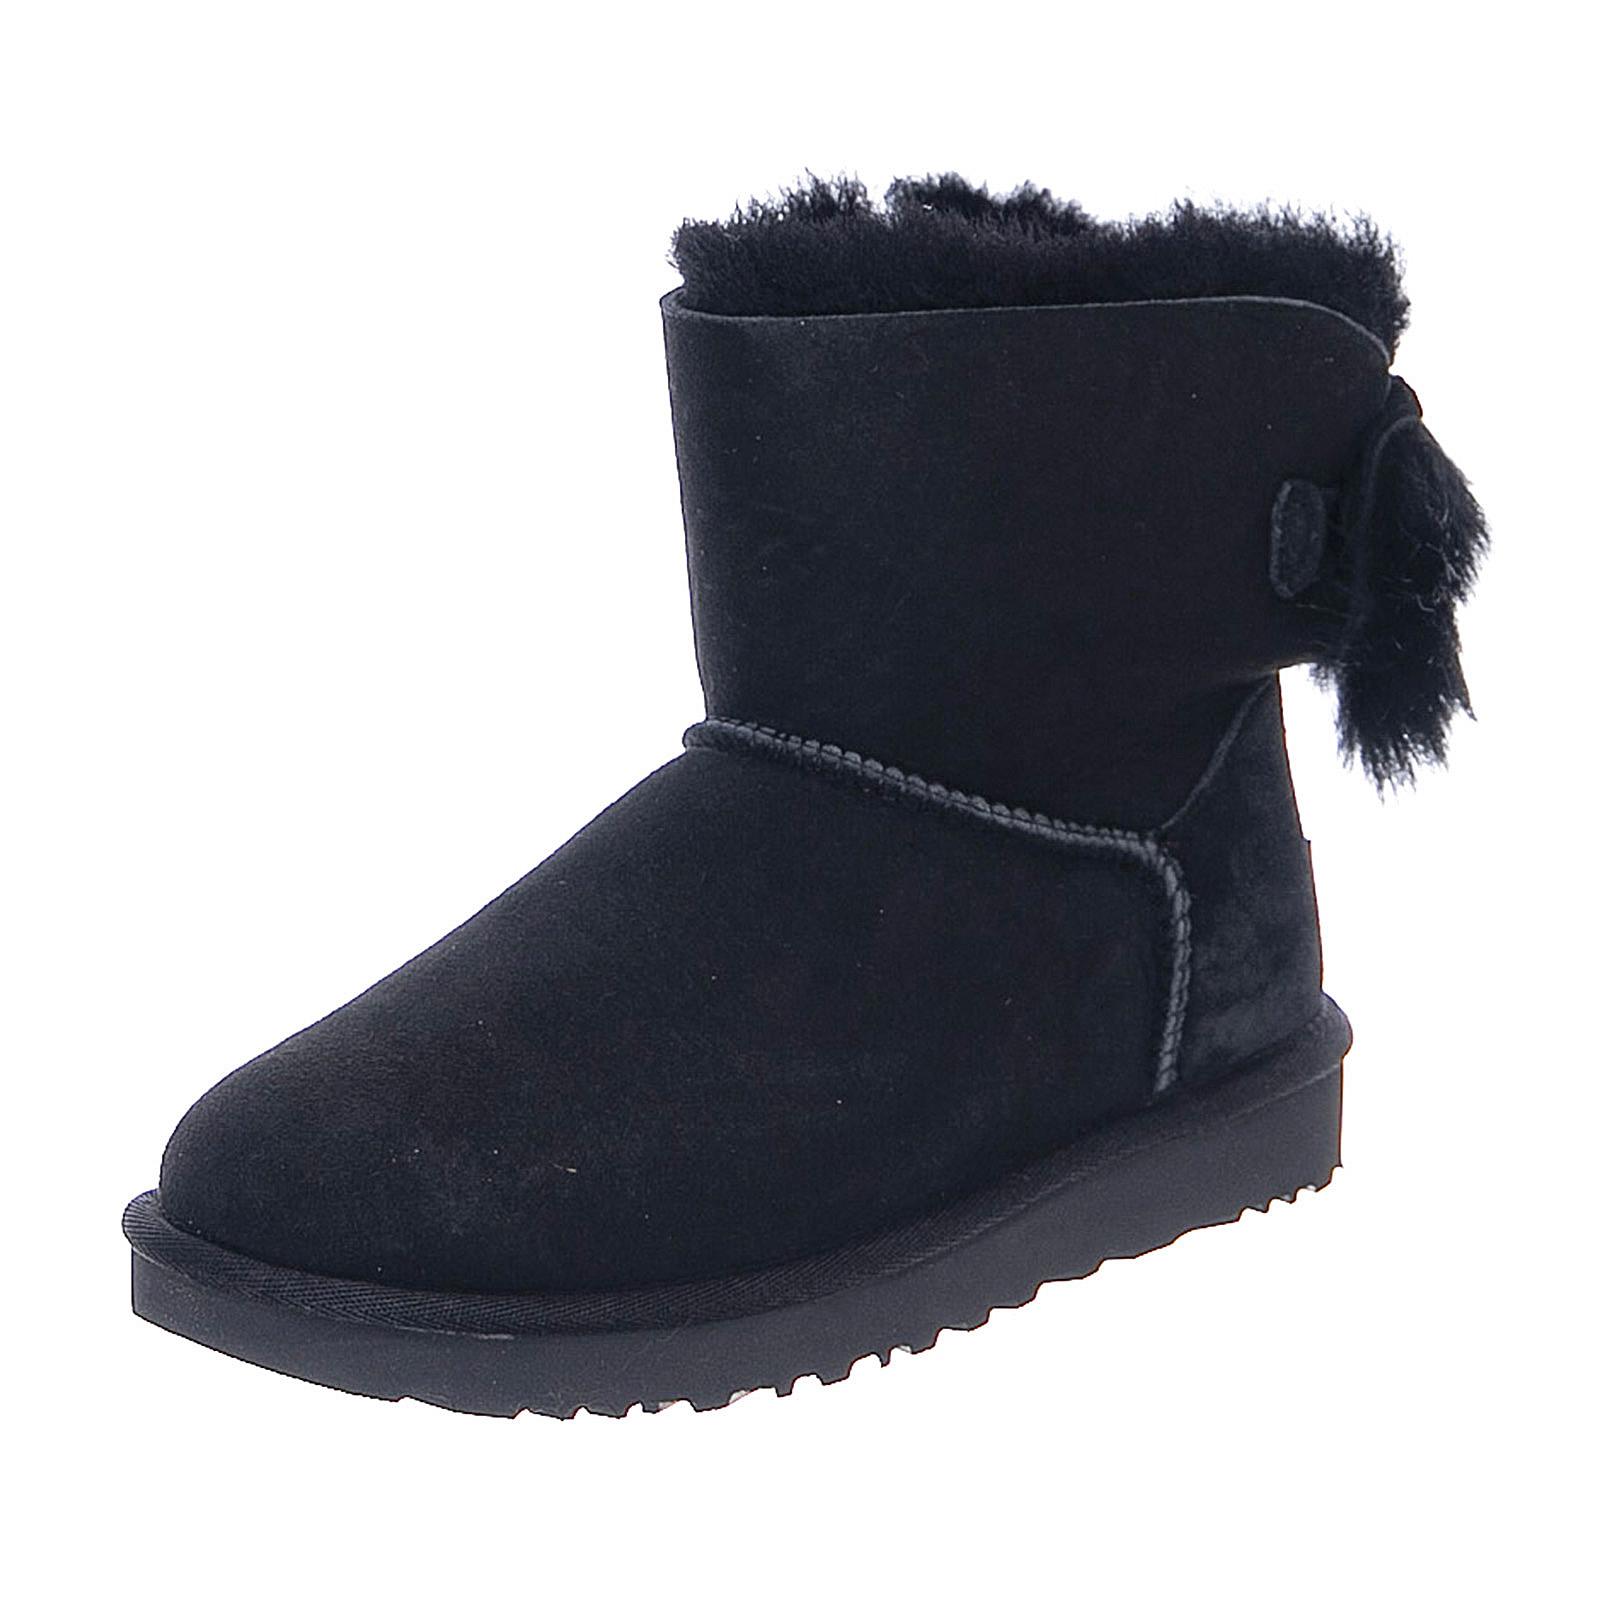 Ugg Fluff Bow Mini Black Stivali Donna Nero | eBay